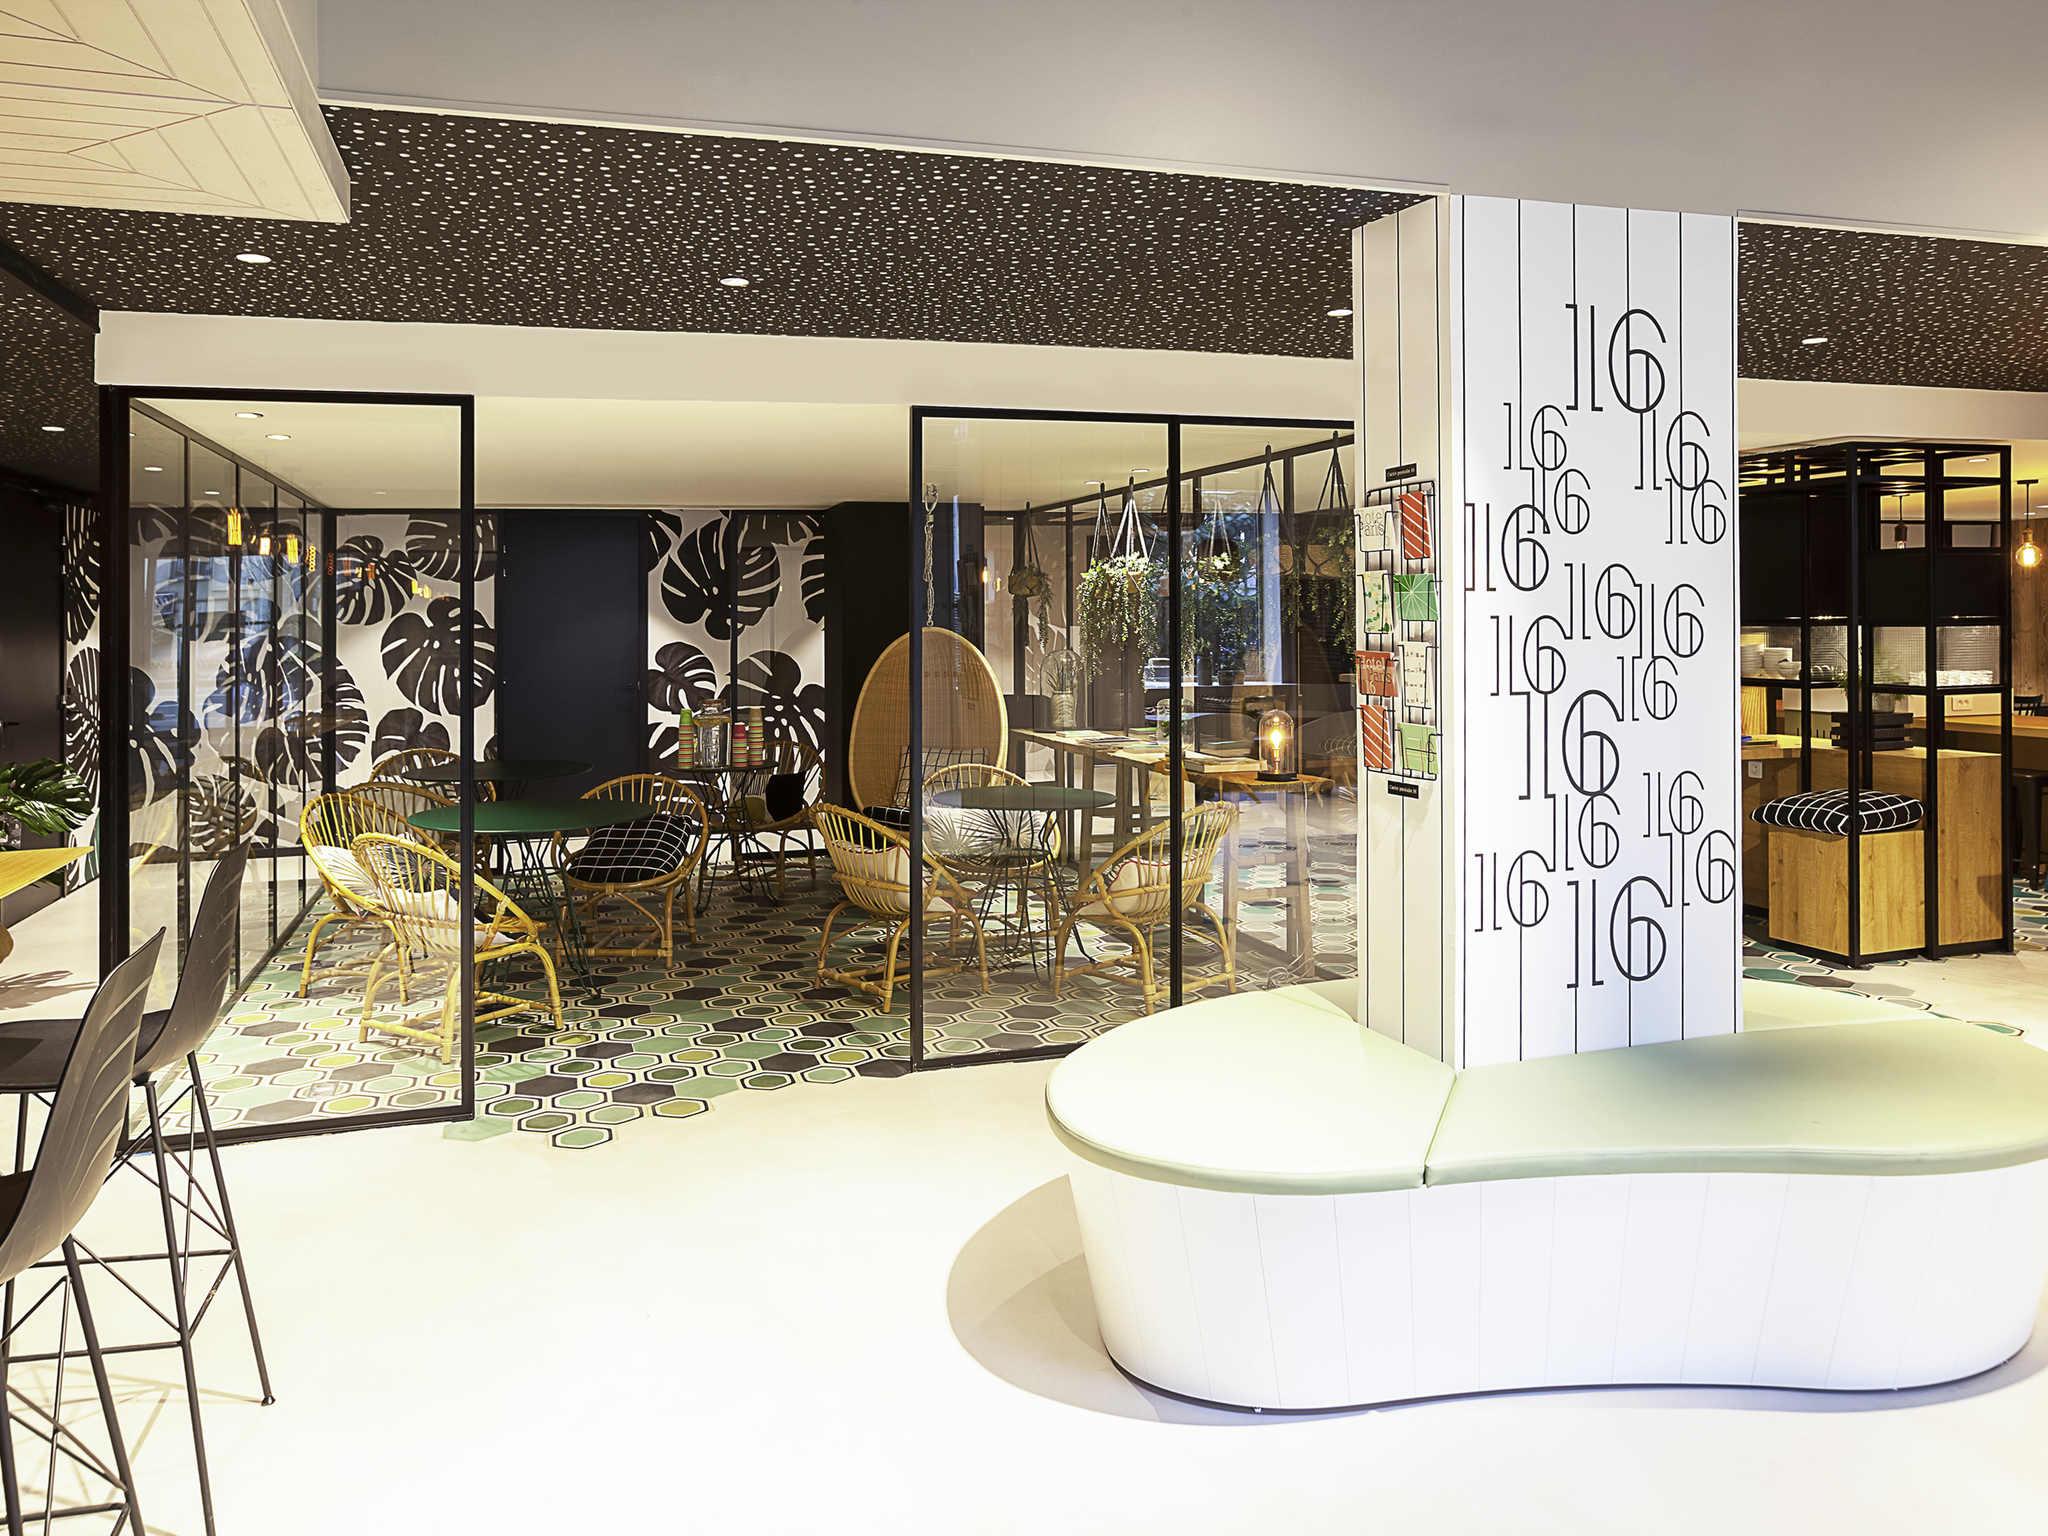 Hotell – ibis Styles Paris 16 Boulogne (öppnar i november 2017)